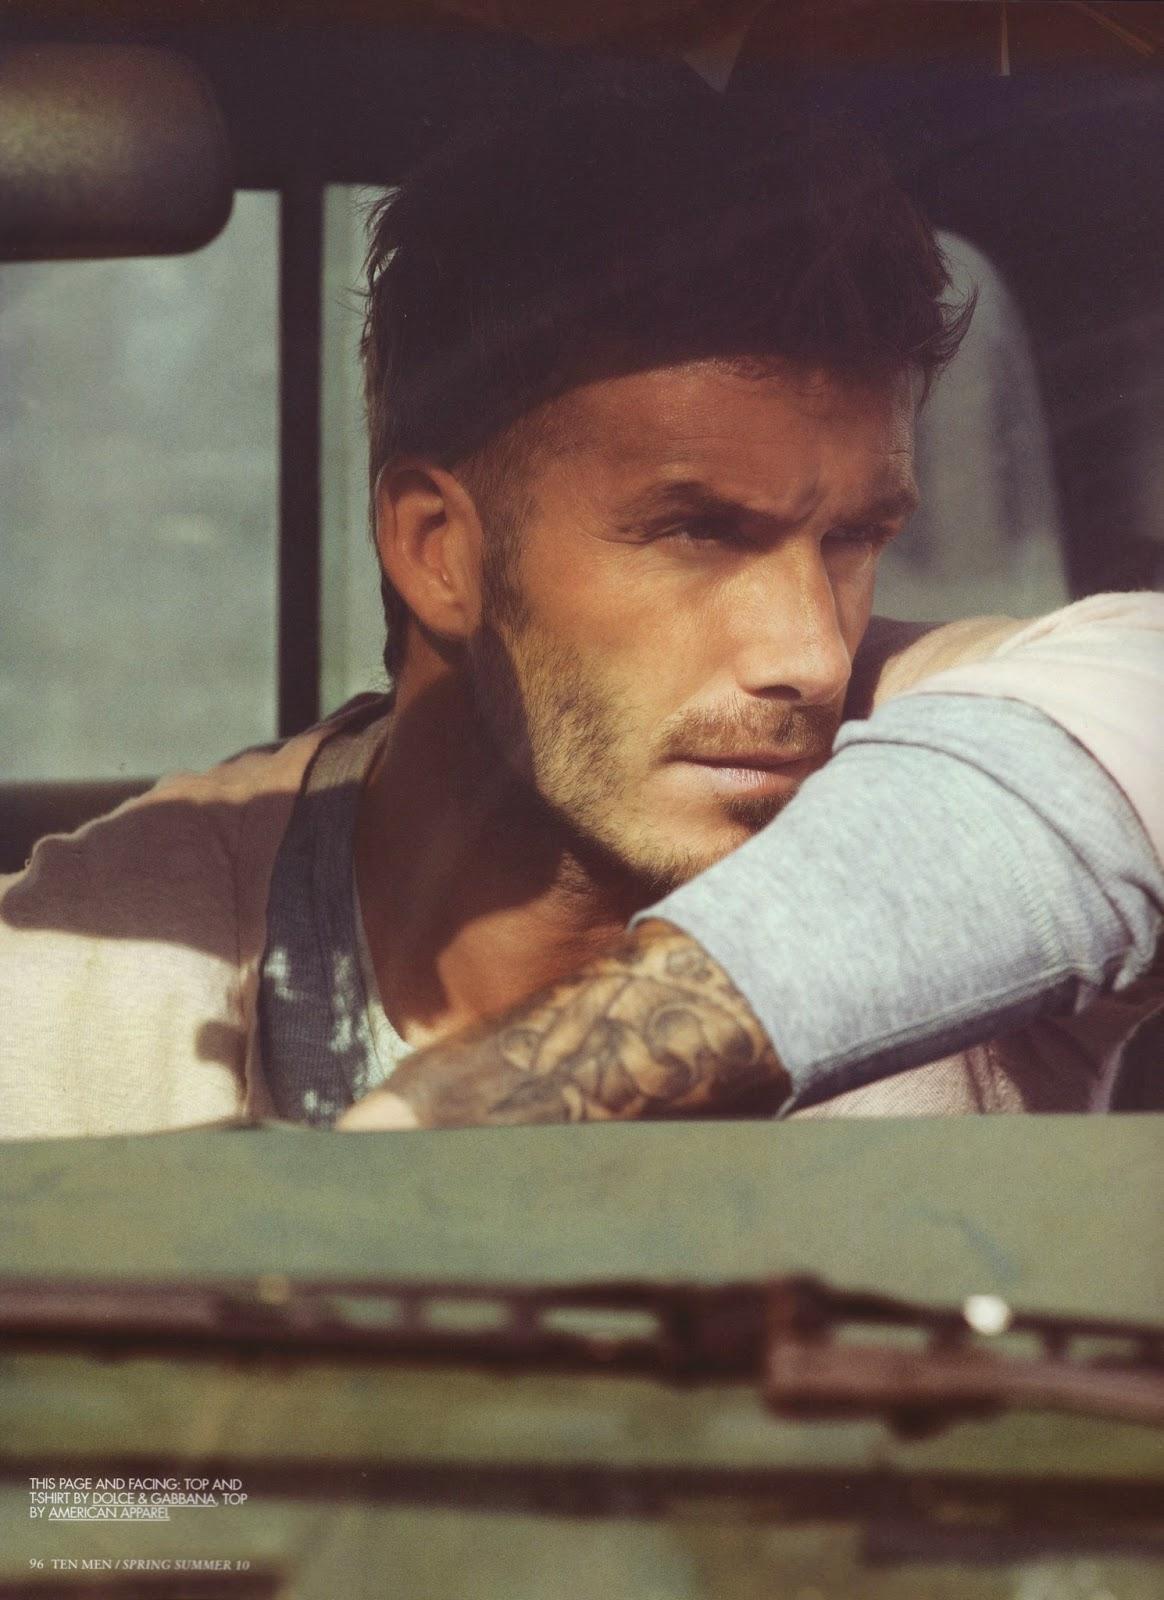 David Beckham 2010 Photoshoot In a Truck